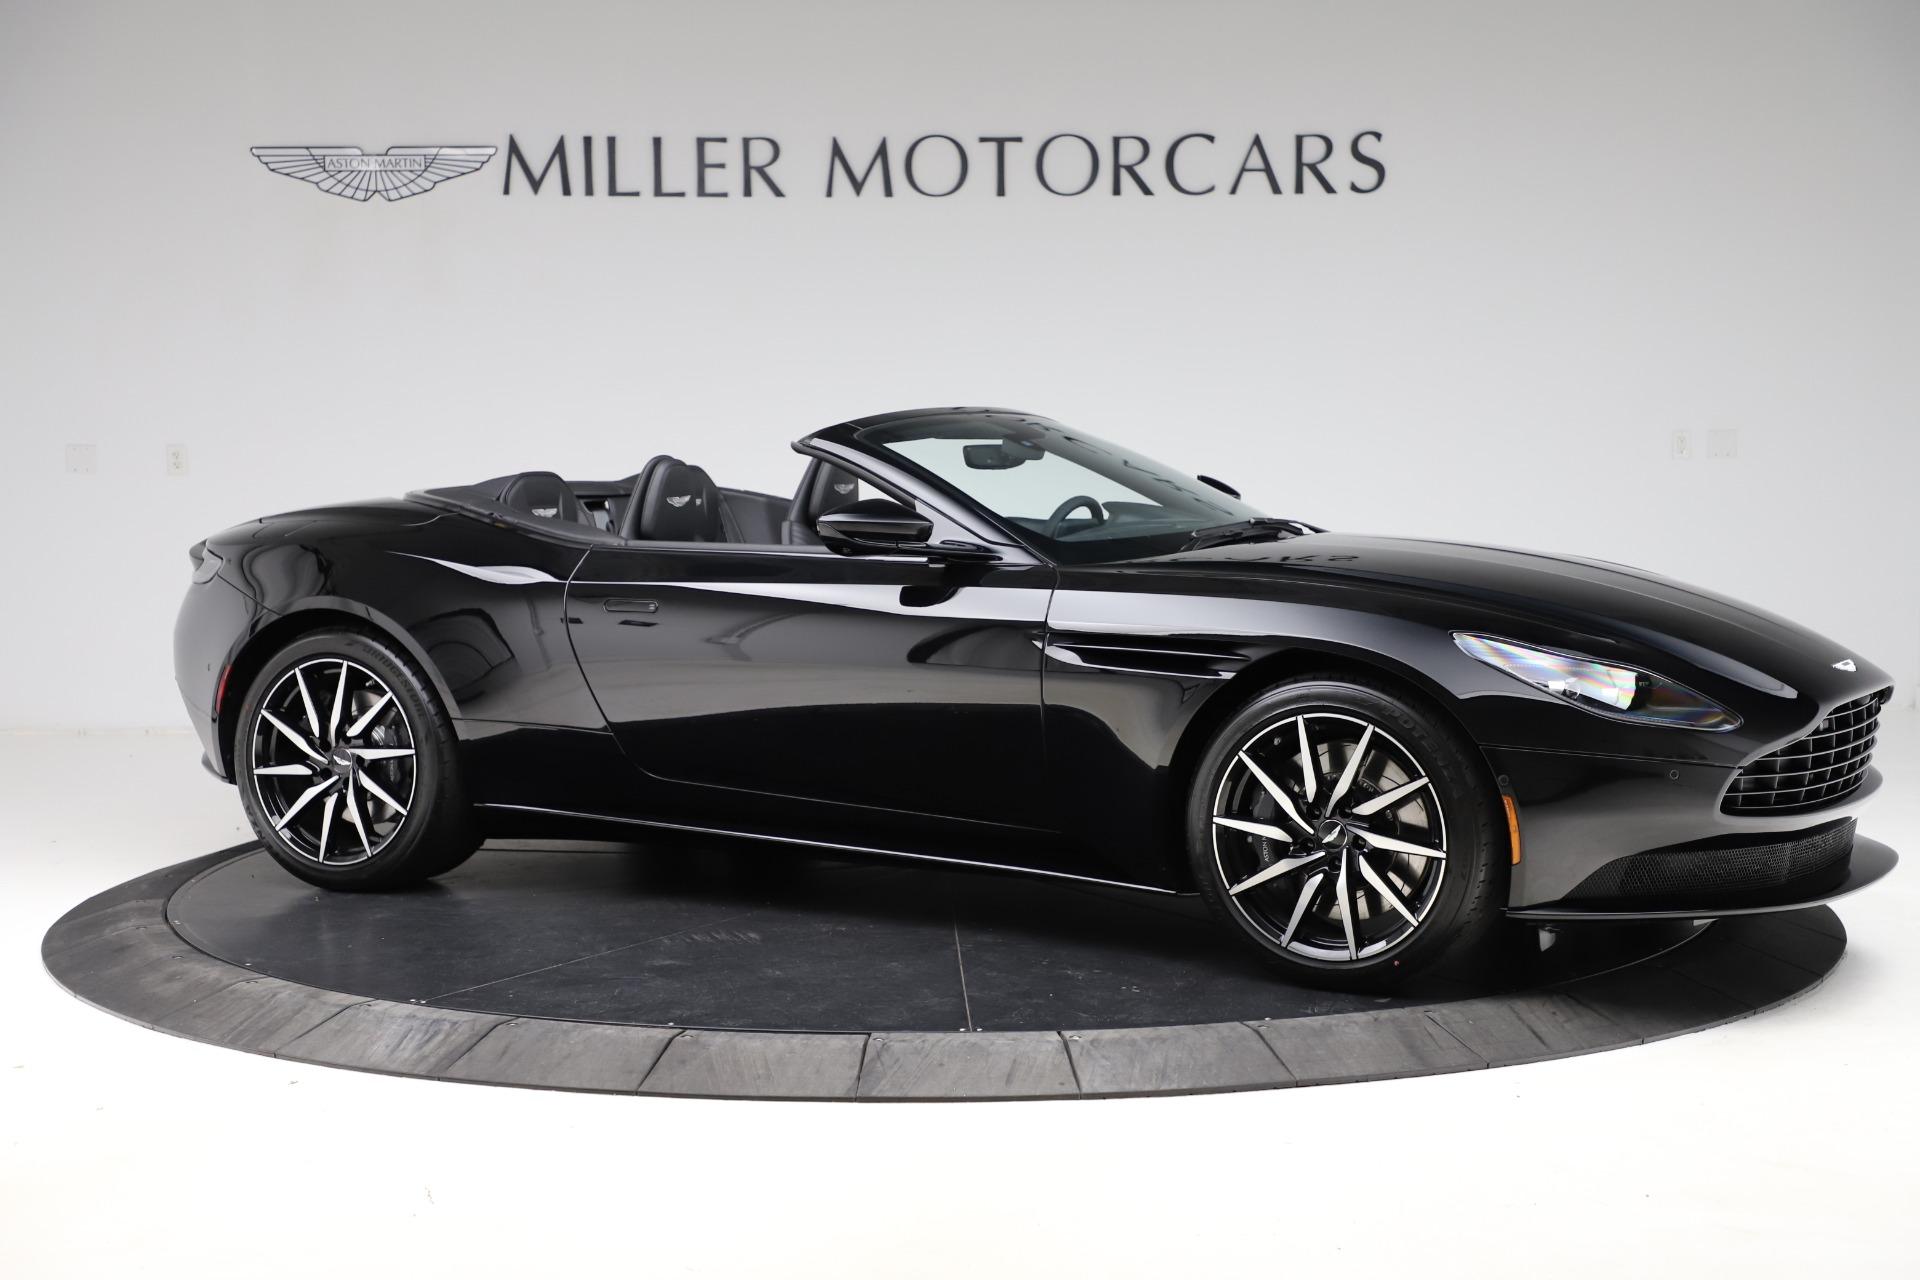 New 2021 Aston Martin Db11 Volante For Sale 254 416 Miller Motorcars Stock A1512